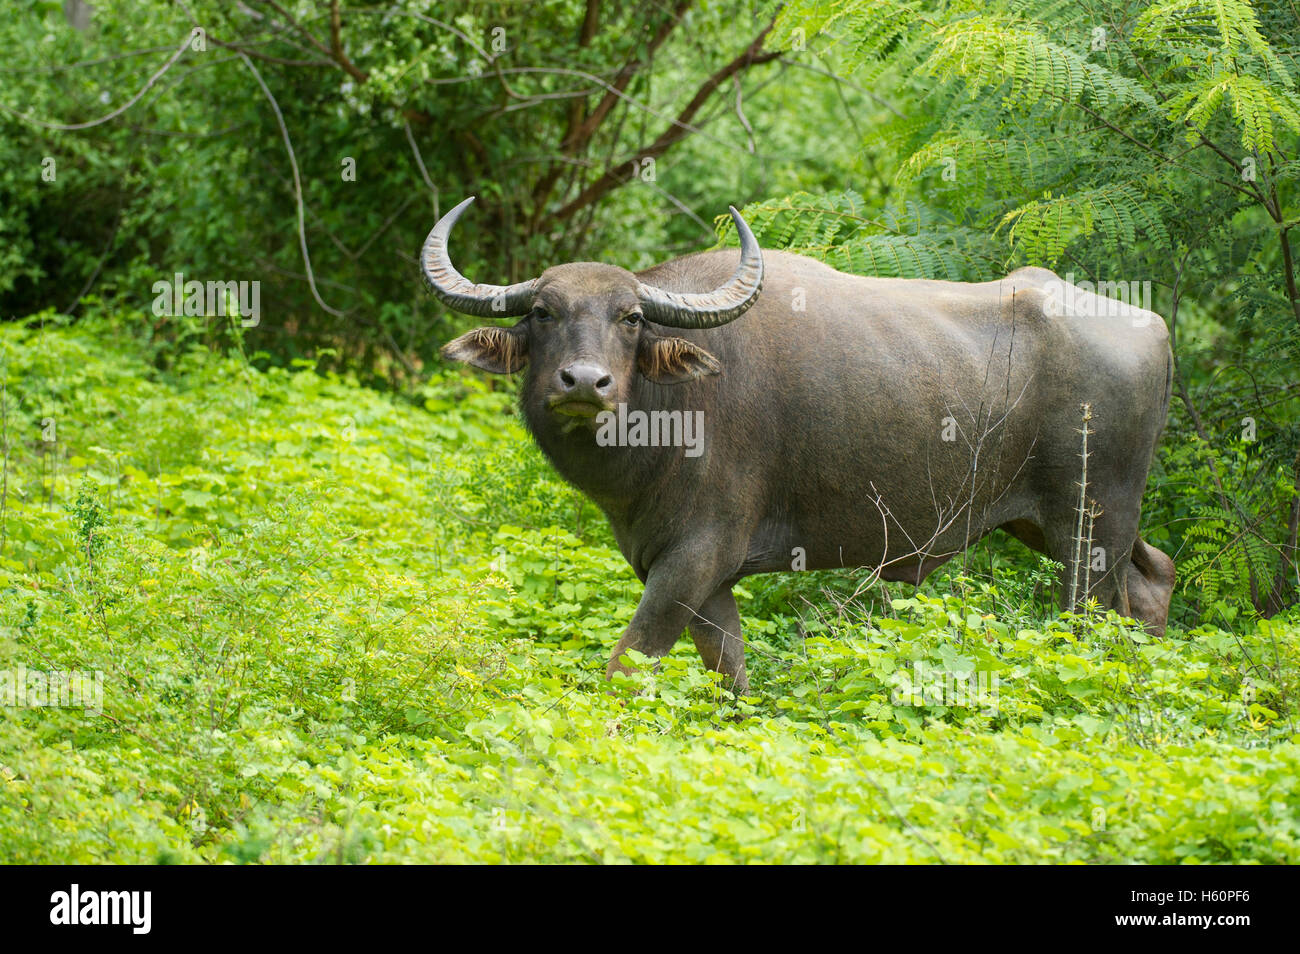 Wild Water buffalo, Bubalus bubalus, Yala National Park, Sri Lanka Immagini Stock